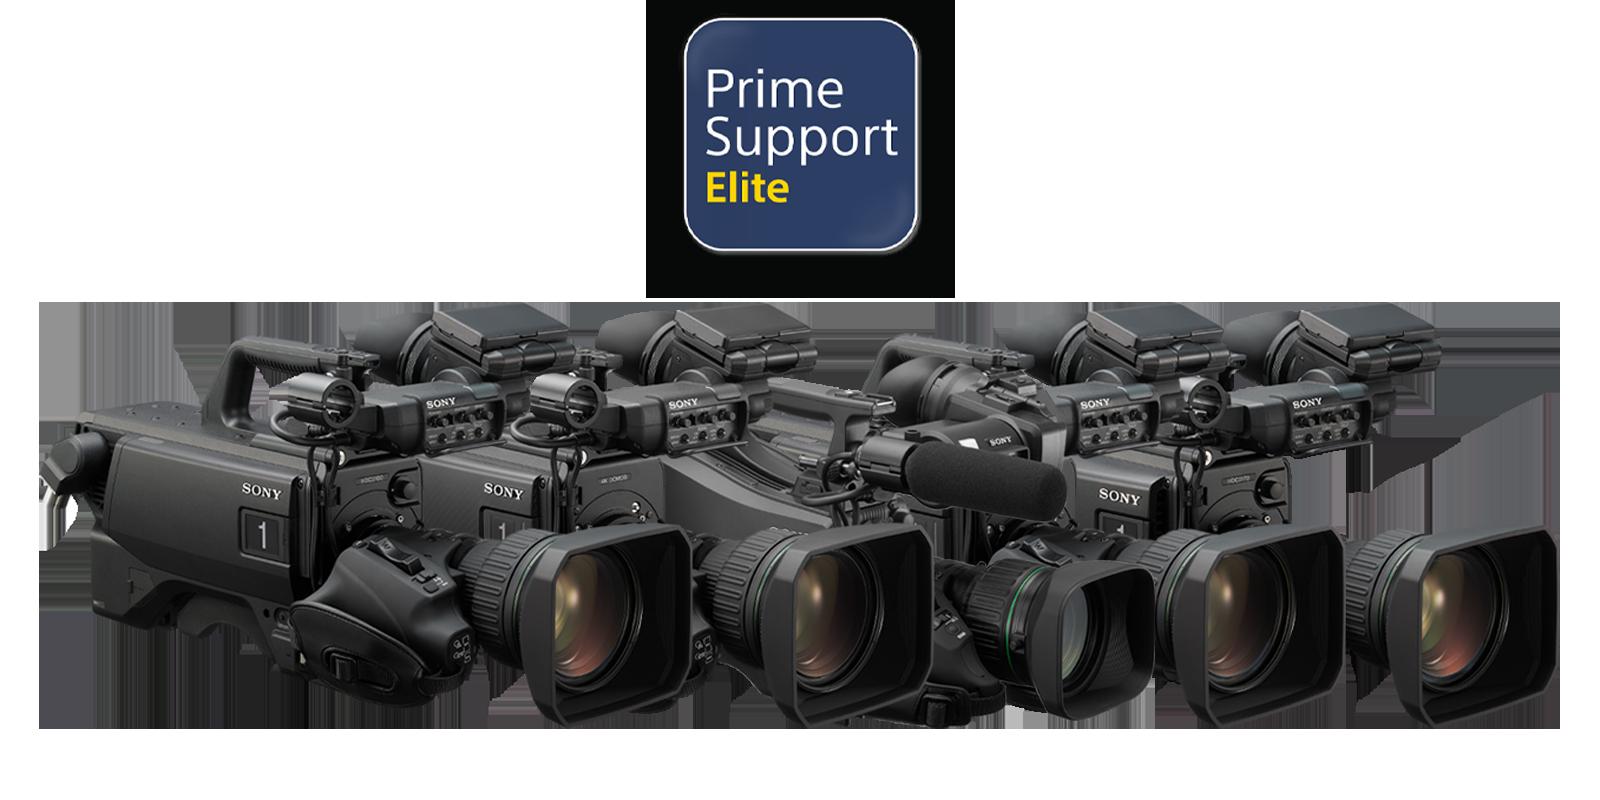 PrimeSupport Elite logo with HDC-3500, HDC-3100, HDC-3170, HDC-5500 and HXC-FB80